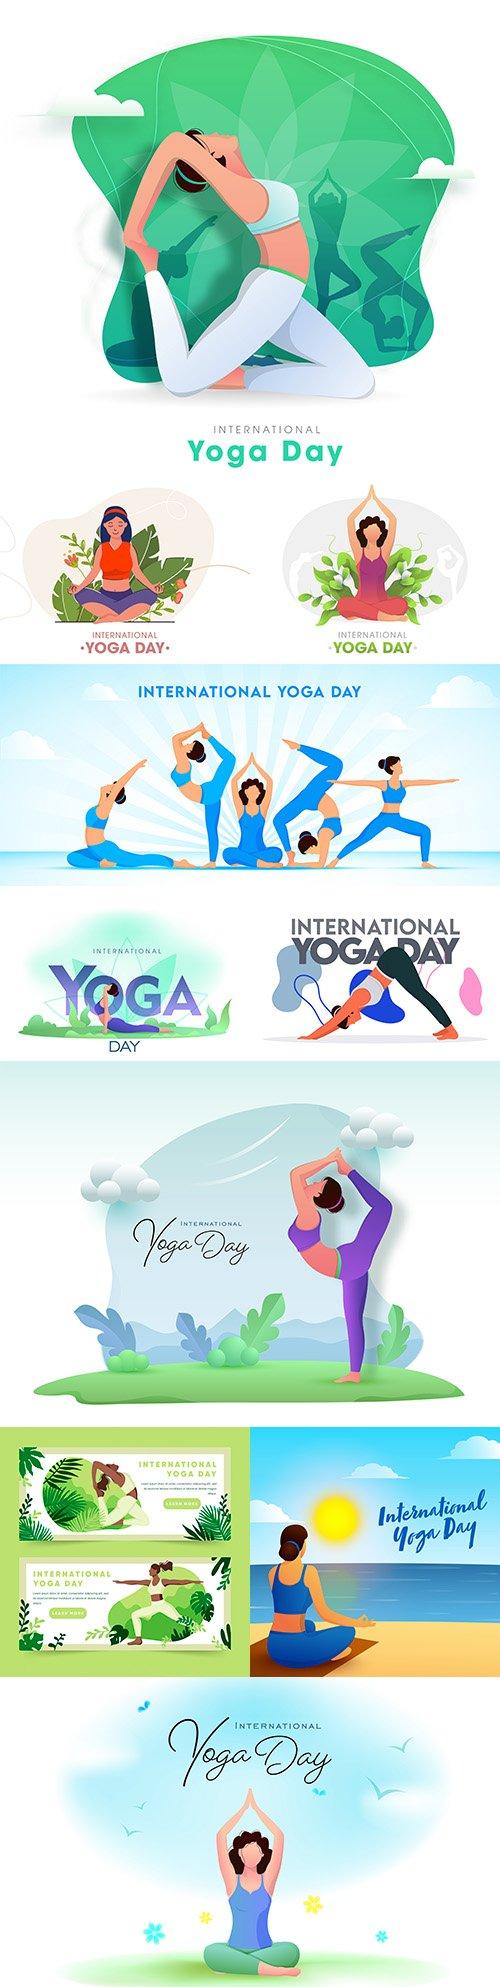 Yoga International day and meditation design illustration 6